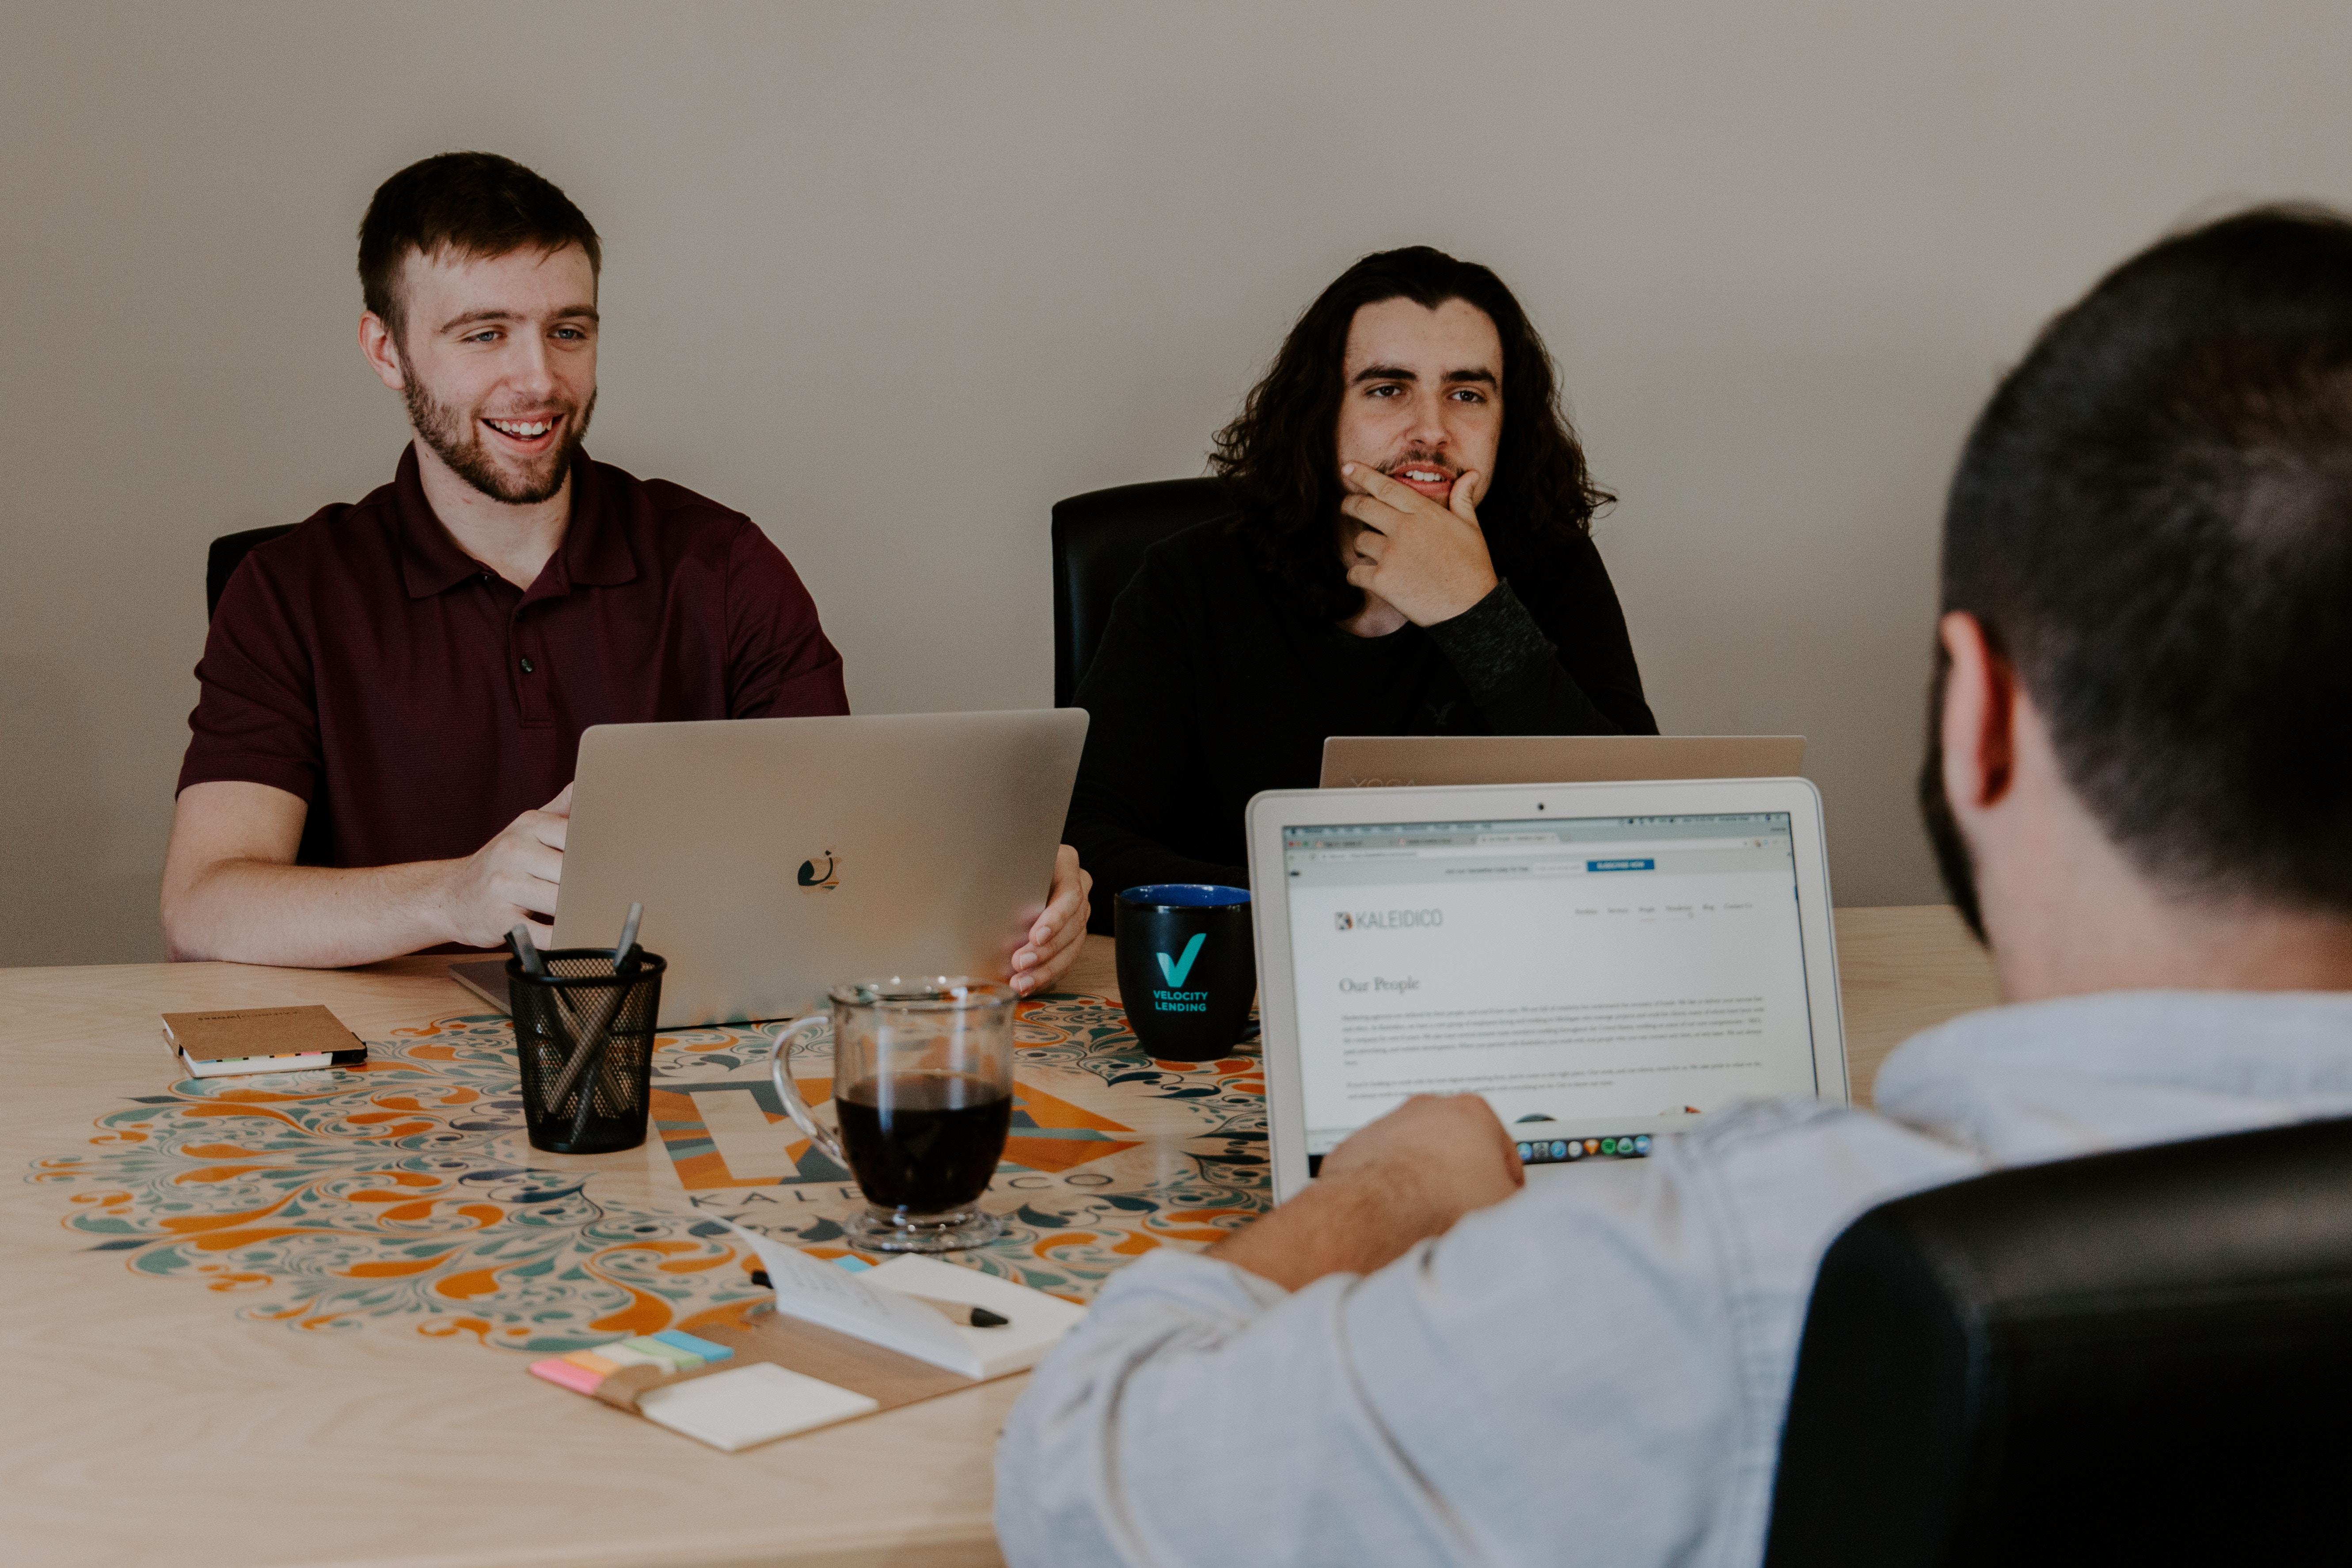 Traja muži sediaci pri stole s notebookmi